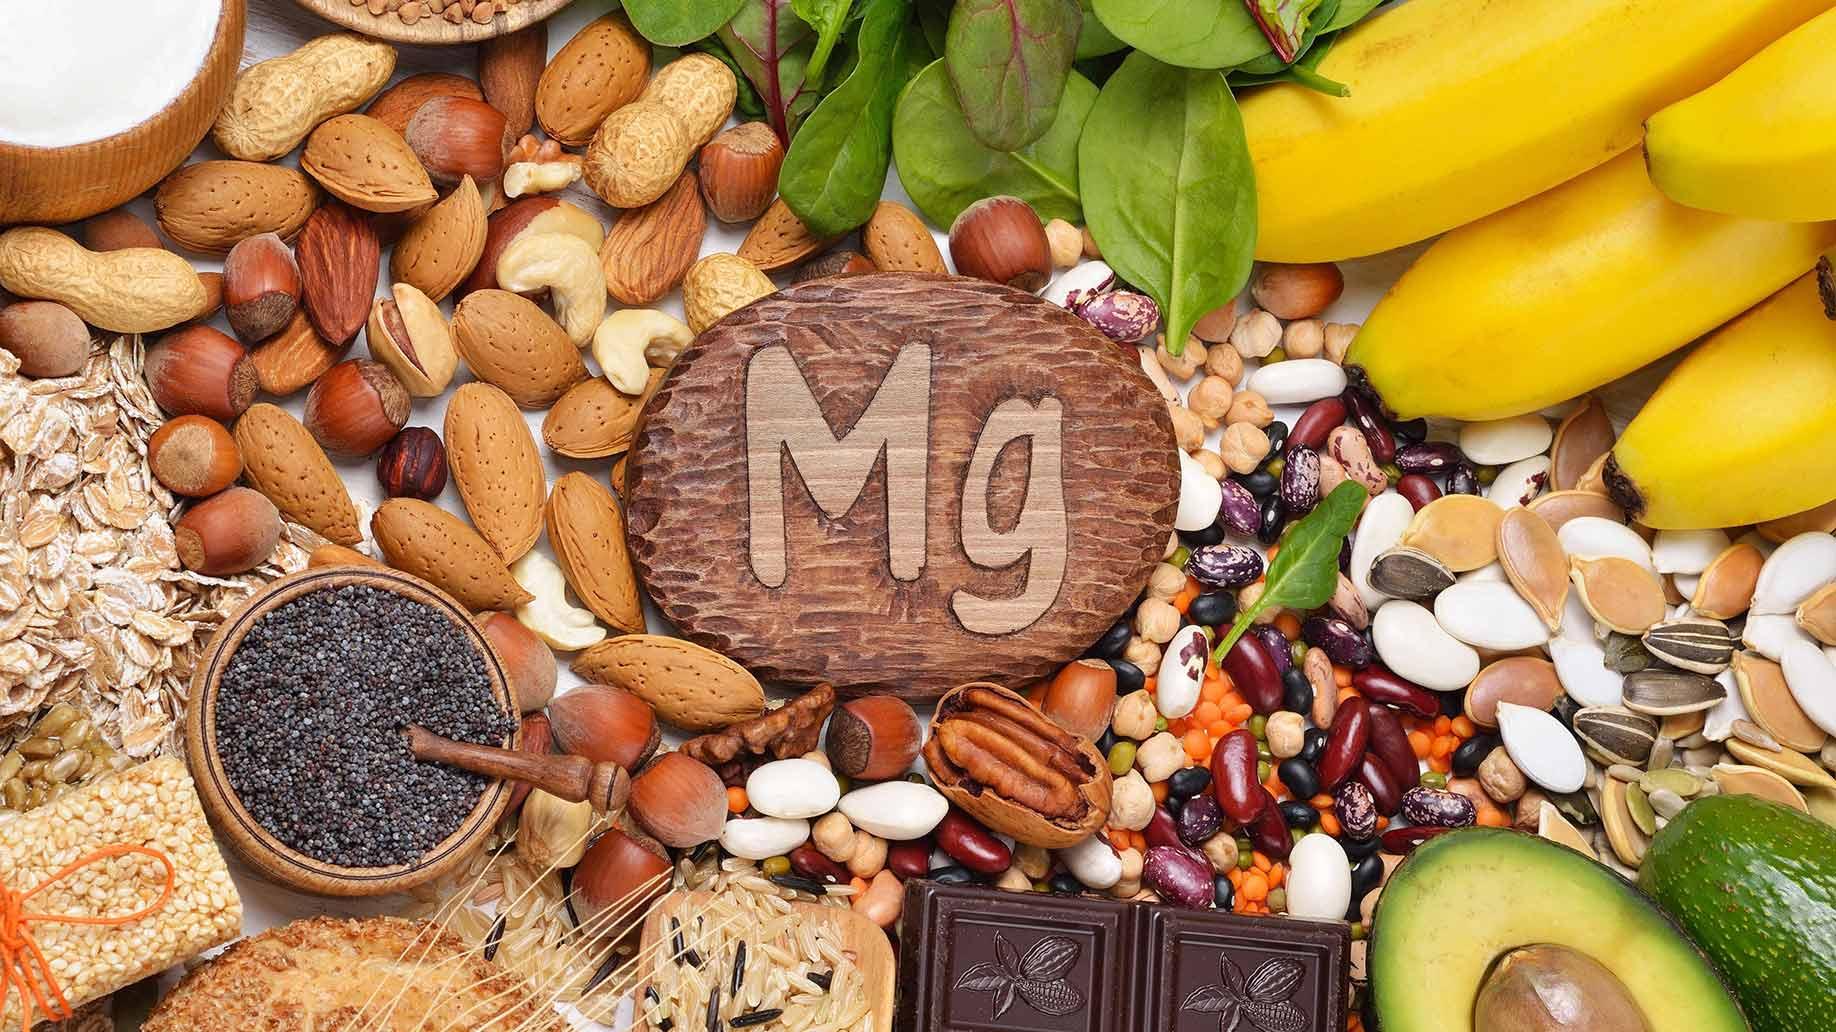 magnesium nuts seeds avocado green leafy vegetables diabetes prediabetes natural remedies